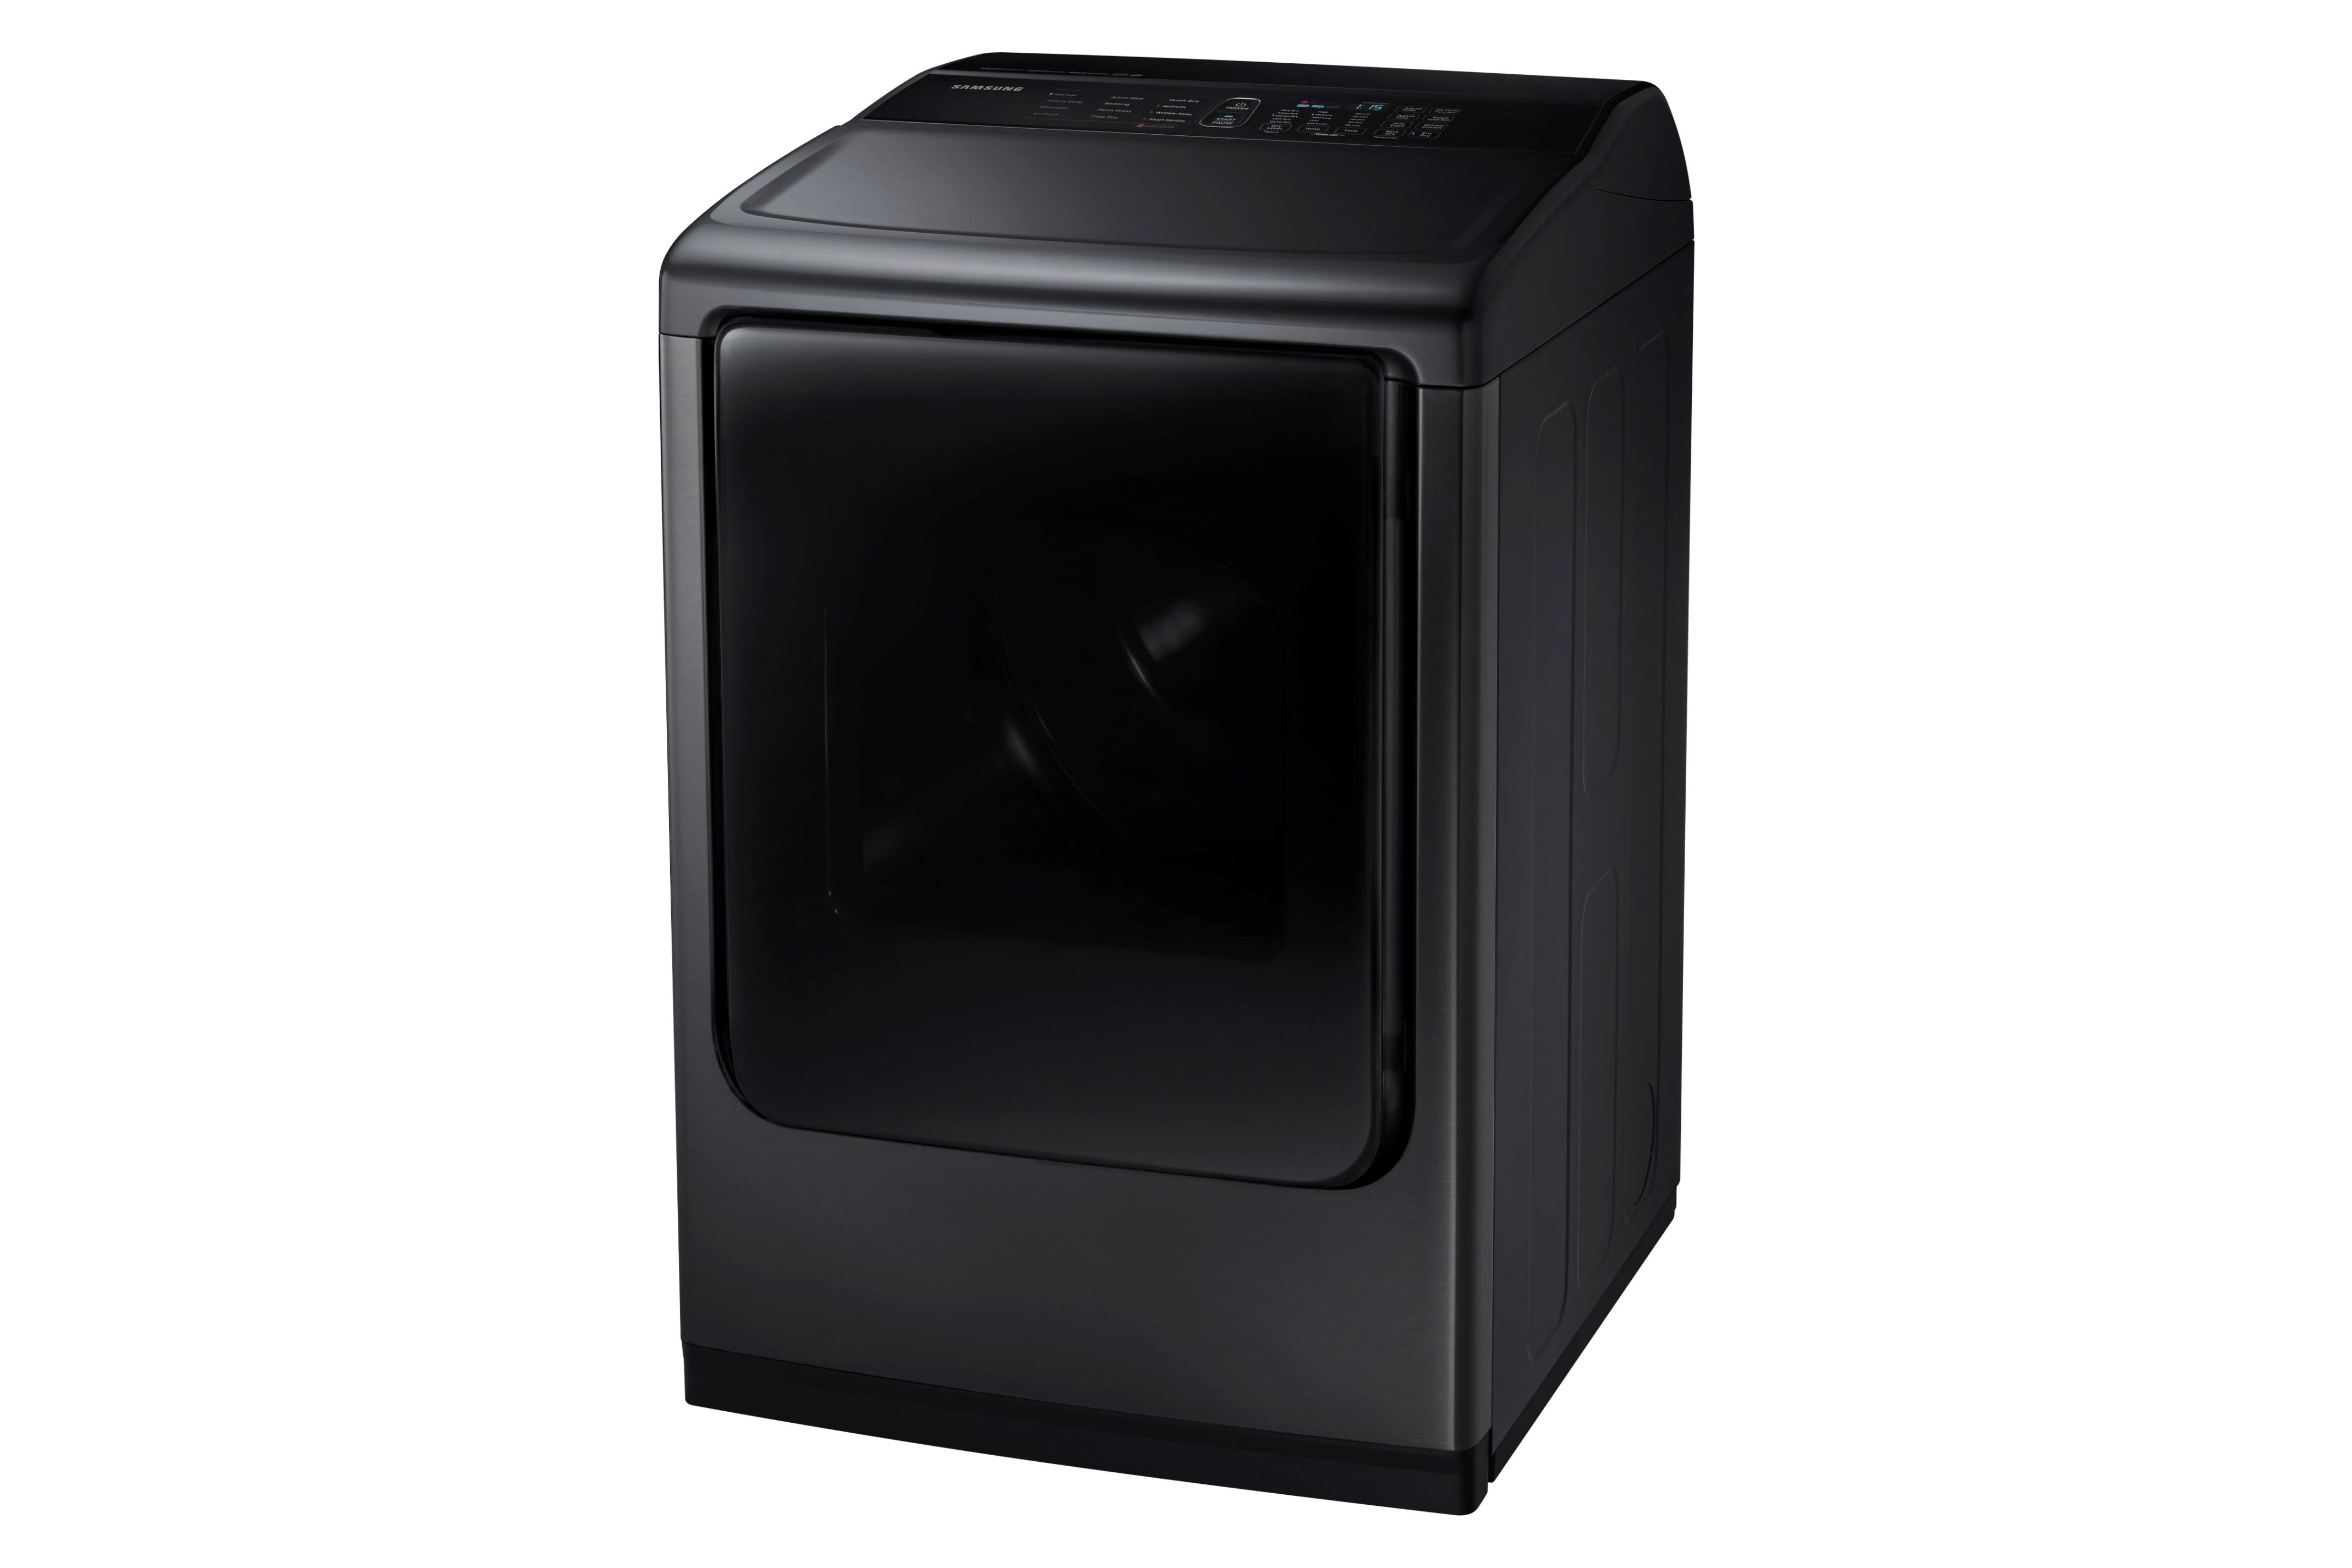 Samsung DV50K8600EV 7.4 cu. ft. Large Capacity Electric Front Load Dryer Black Stainless Steel